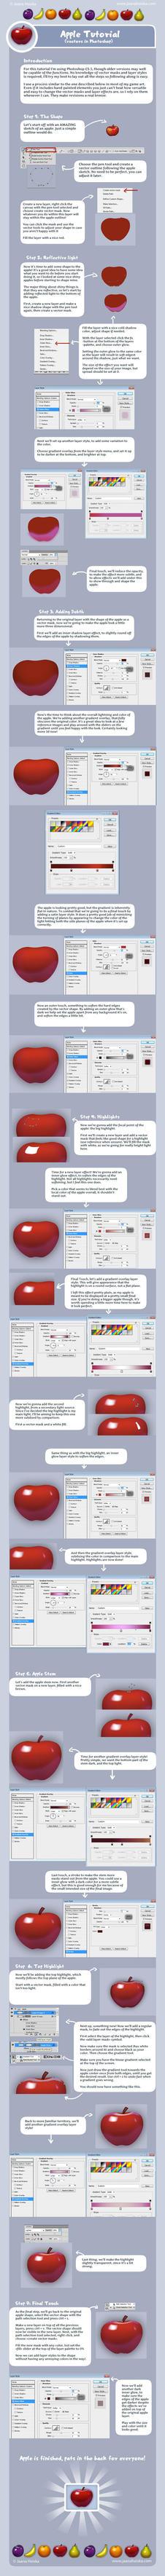 Apple Tutorial by Suncut